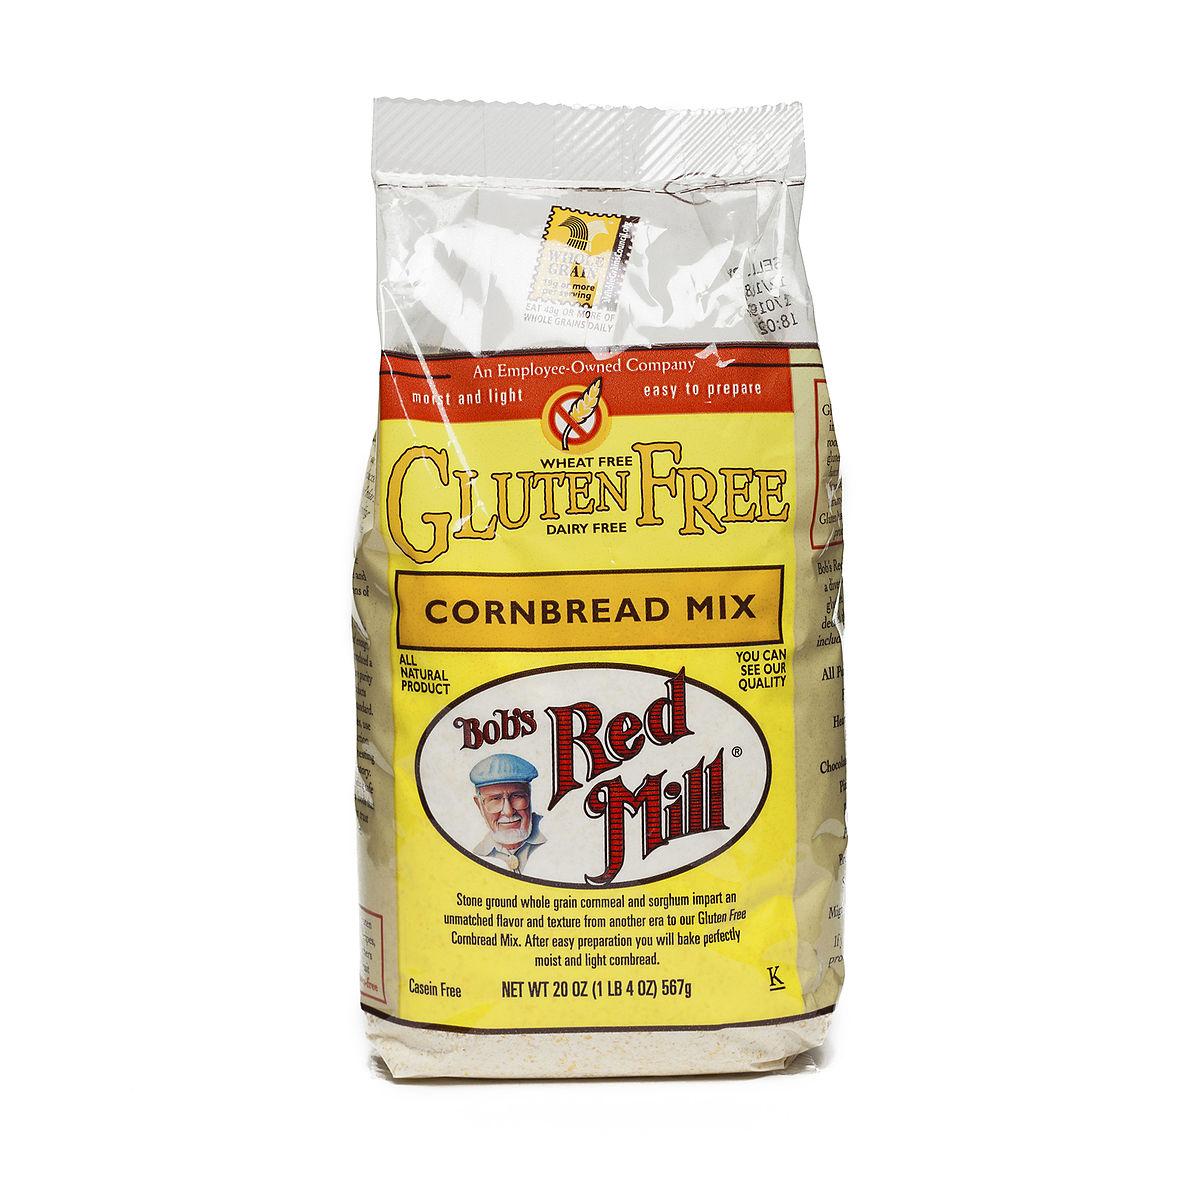 Gf cornbread mix